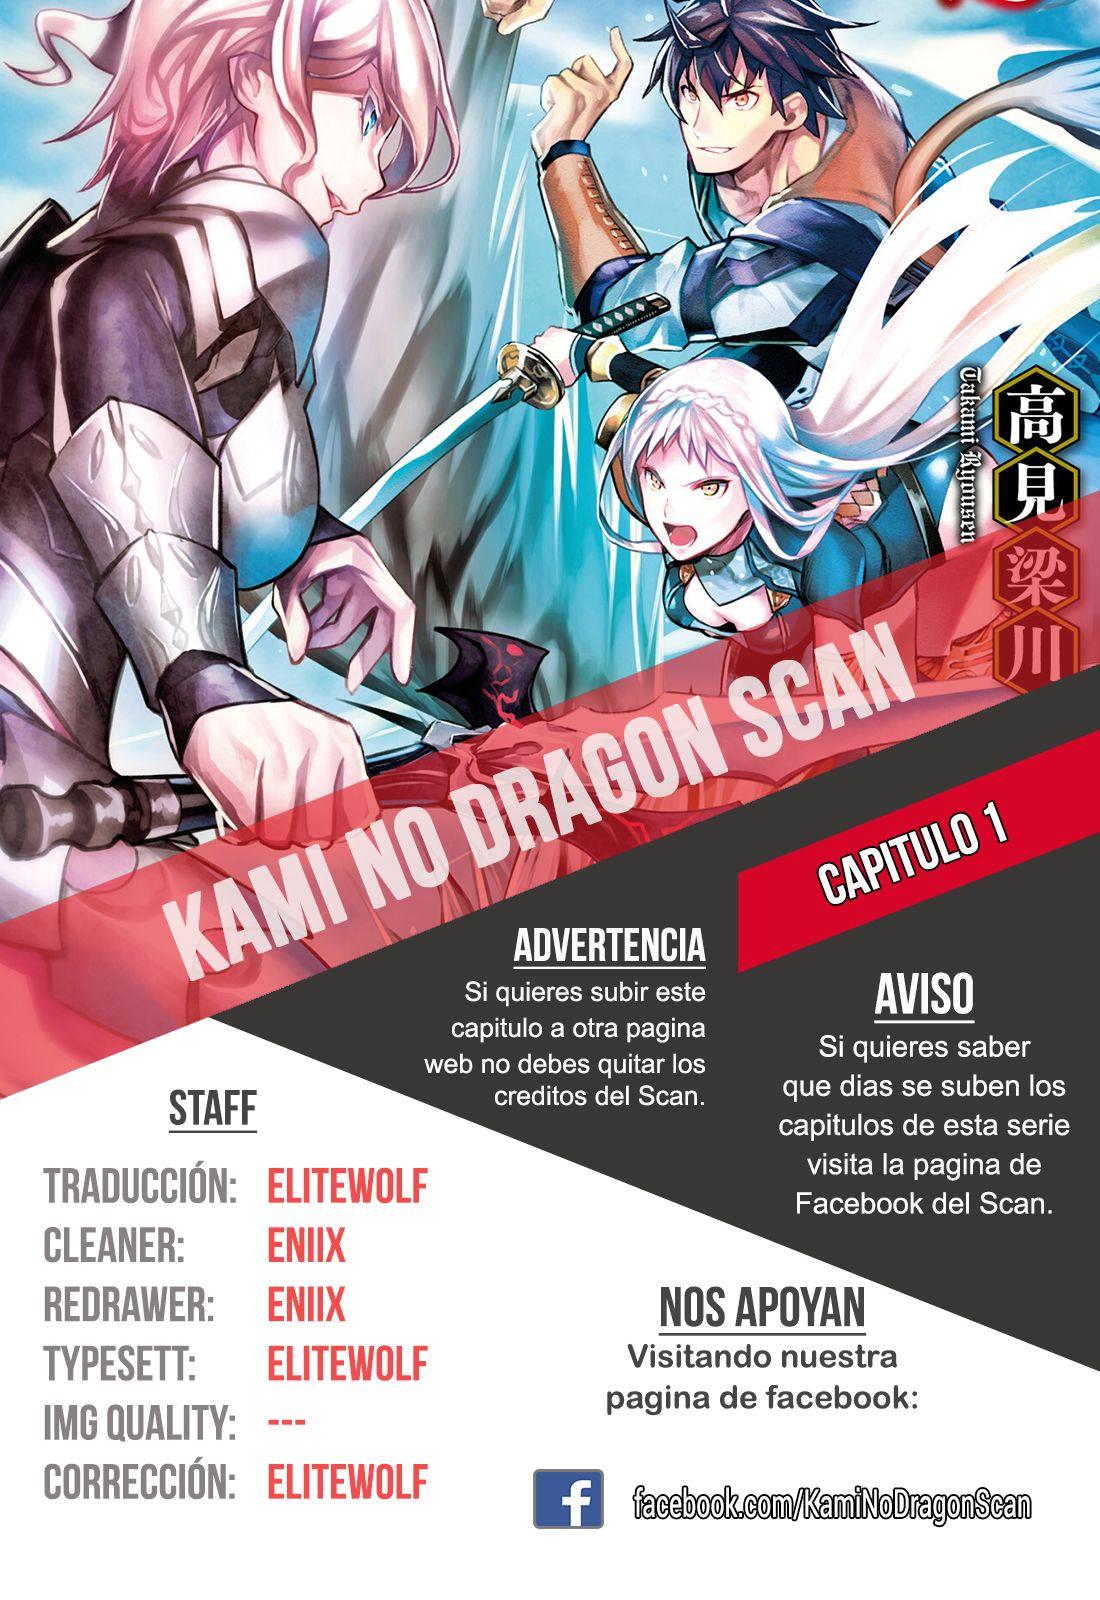 https://c9.mangatag.com/es_manga/pic3/22/23510/593626/f55e60acffb1a69a5ecc2abef59c8665.jpg Page 1